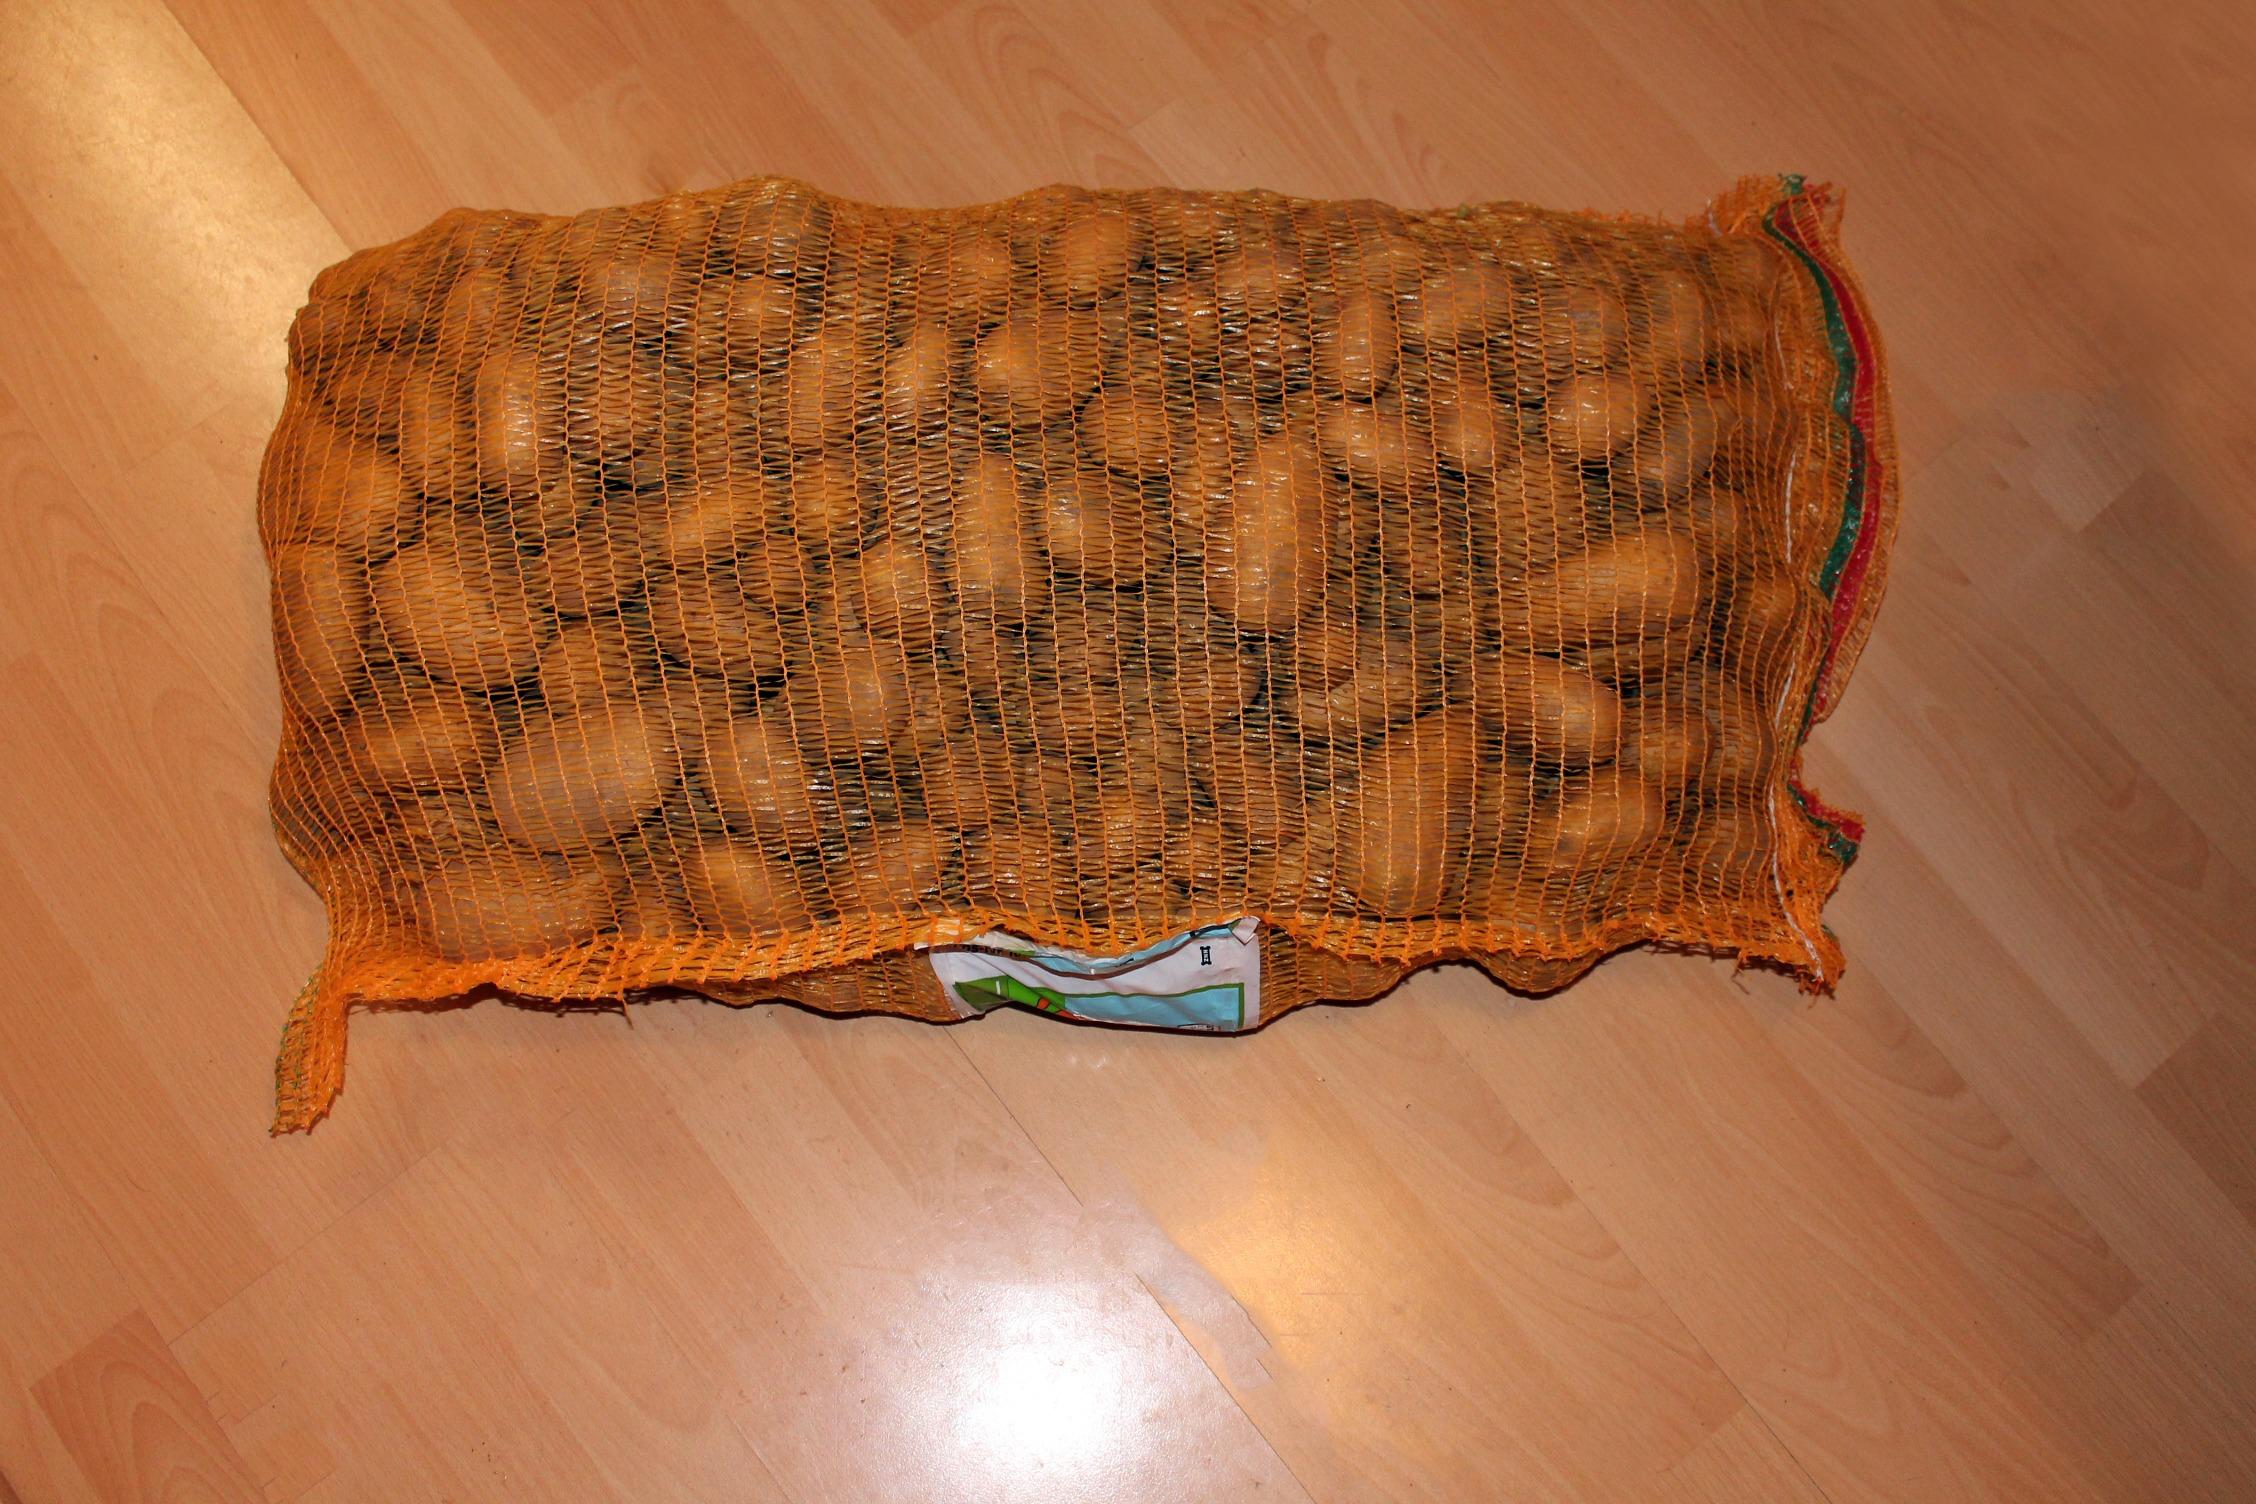 Kostenlose foto  Holz Muster Lebensmittel Mbel Material